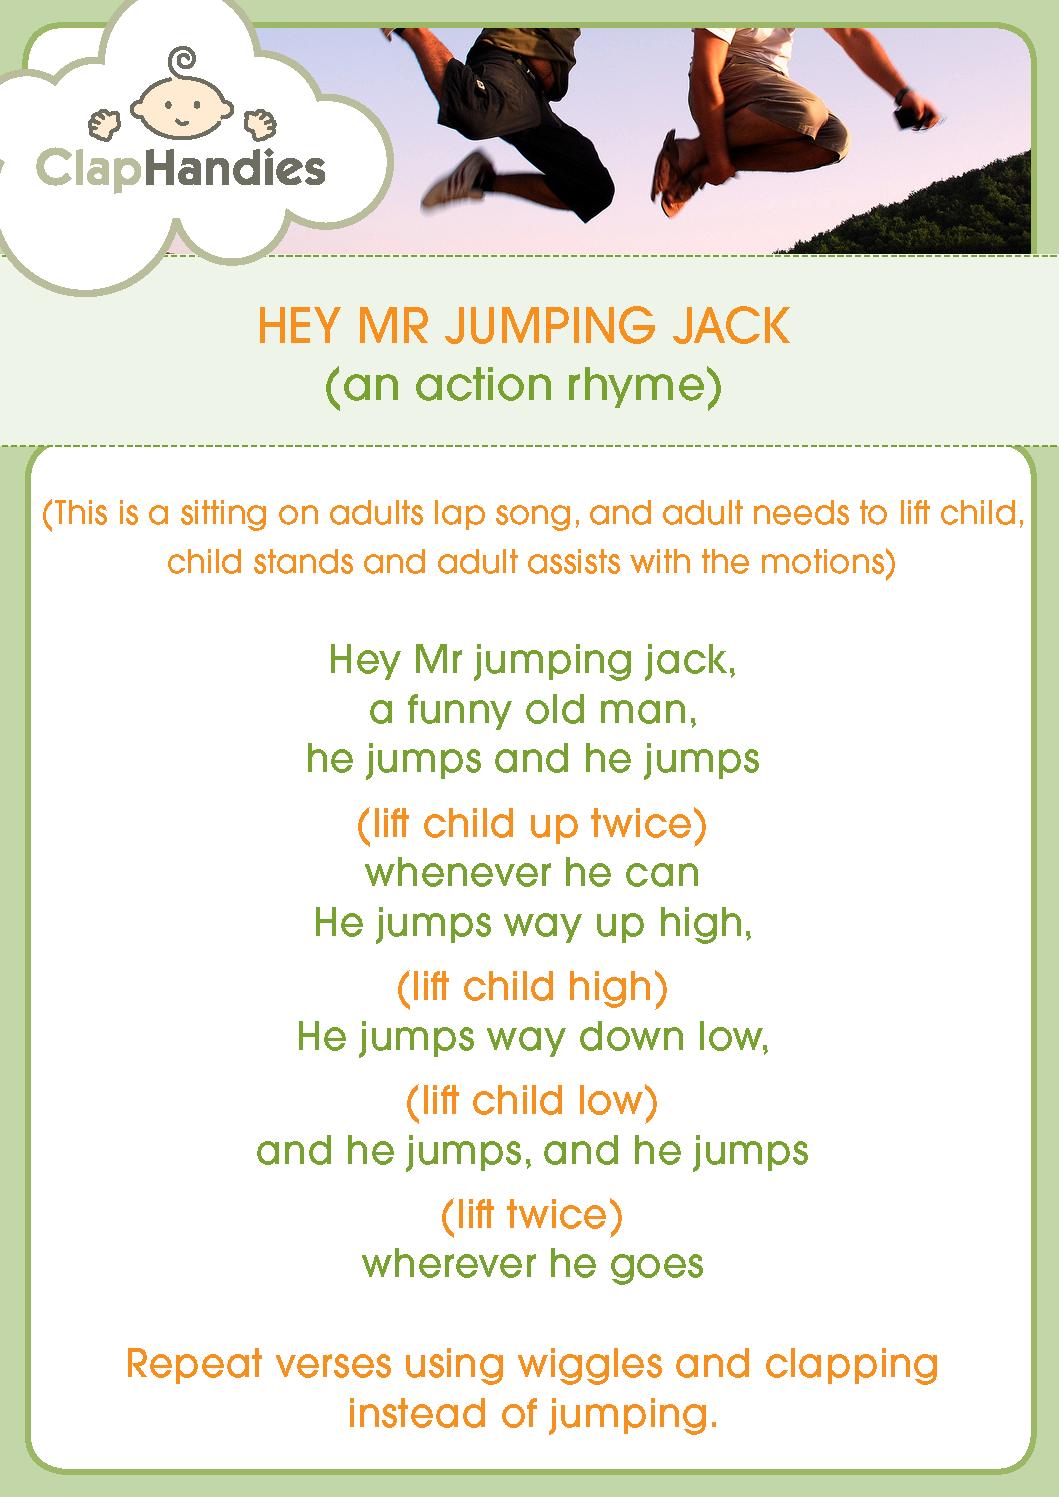 Hey Mr Jumping Jack